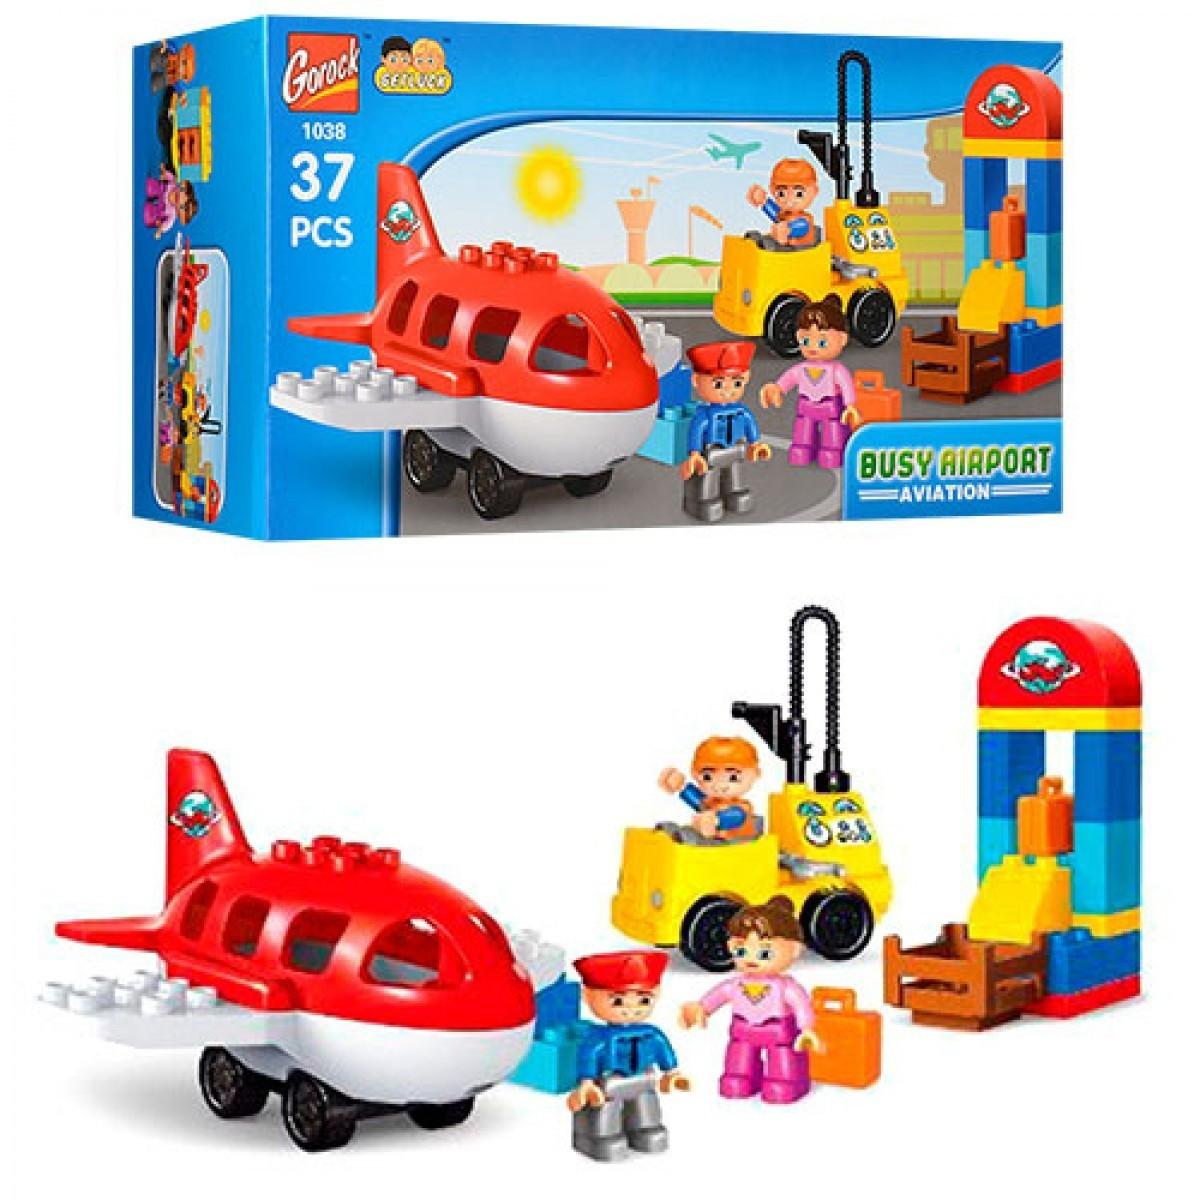 Конструктор дитячий Gorock Аеропорт 37 деталей